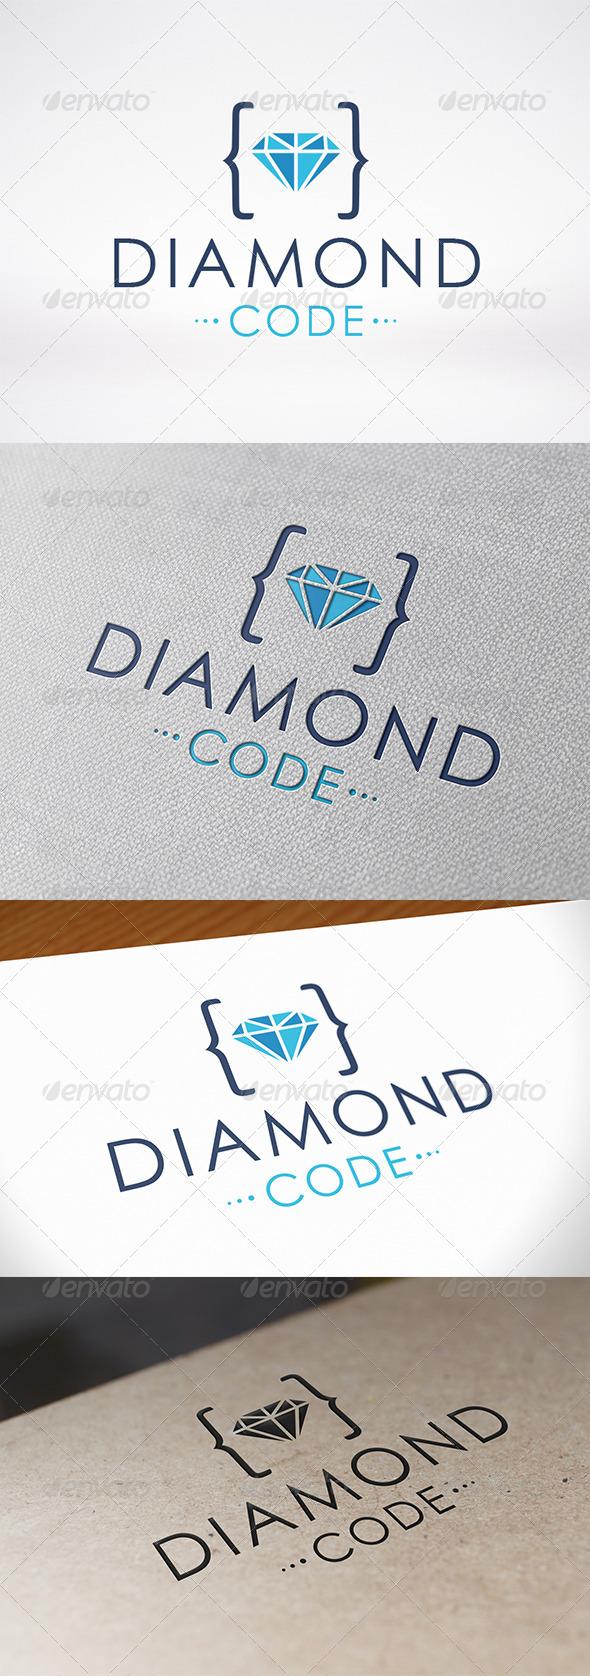 Code Diamond Logo Template